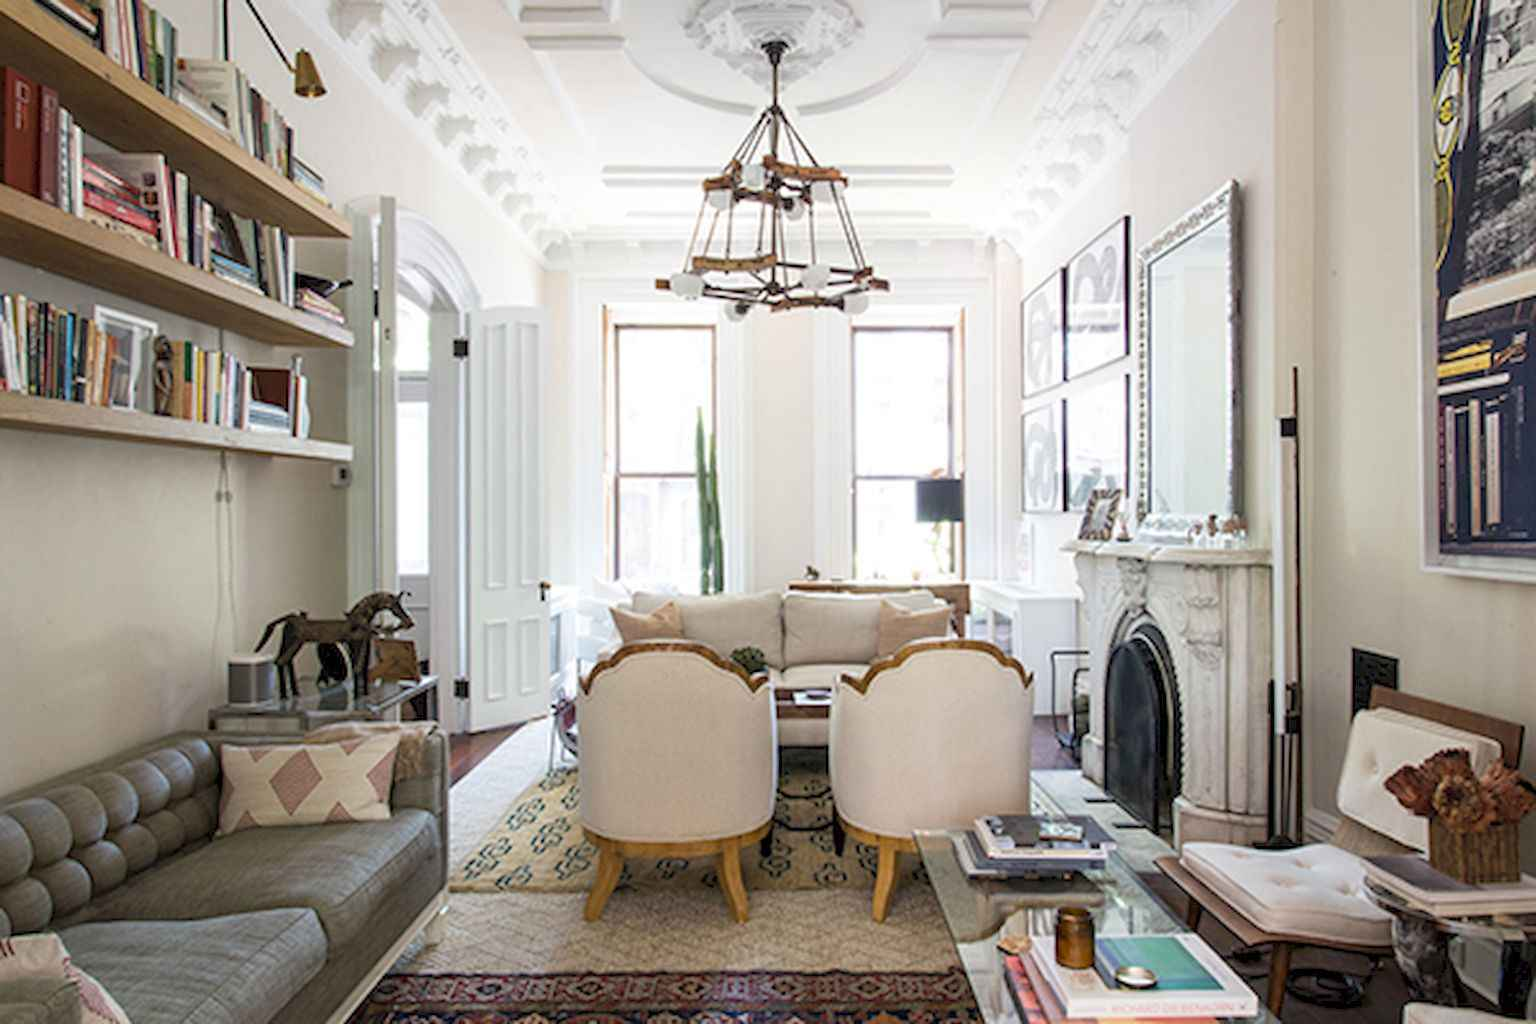 Simple clean vintage living room decorating ideas (40)